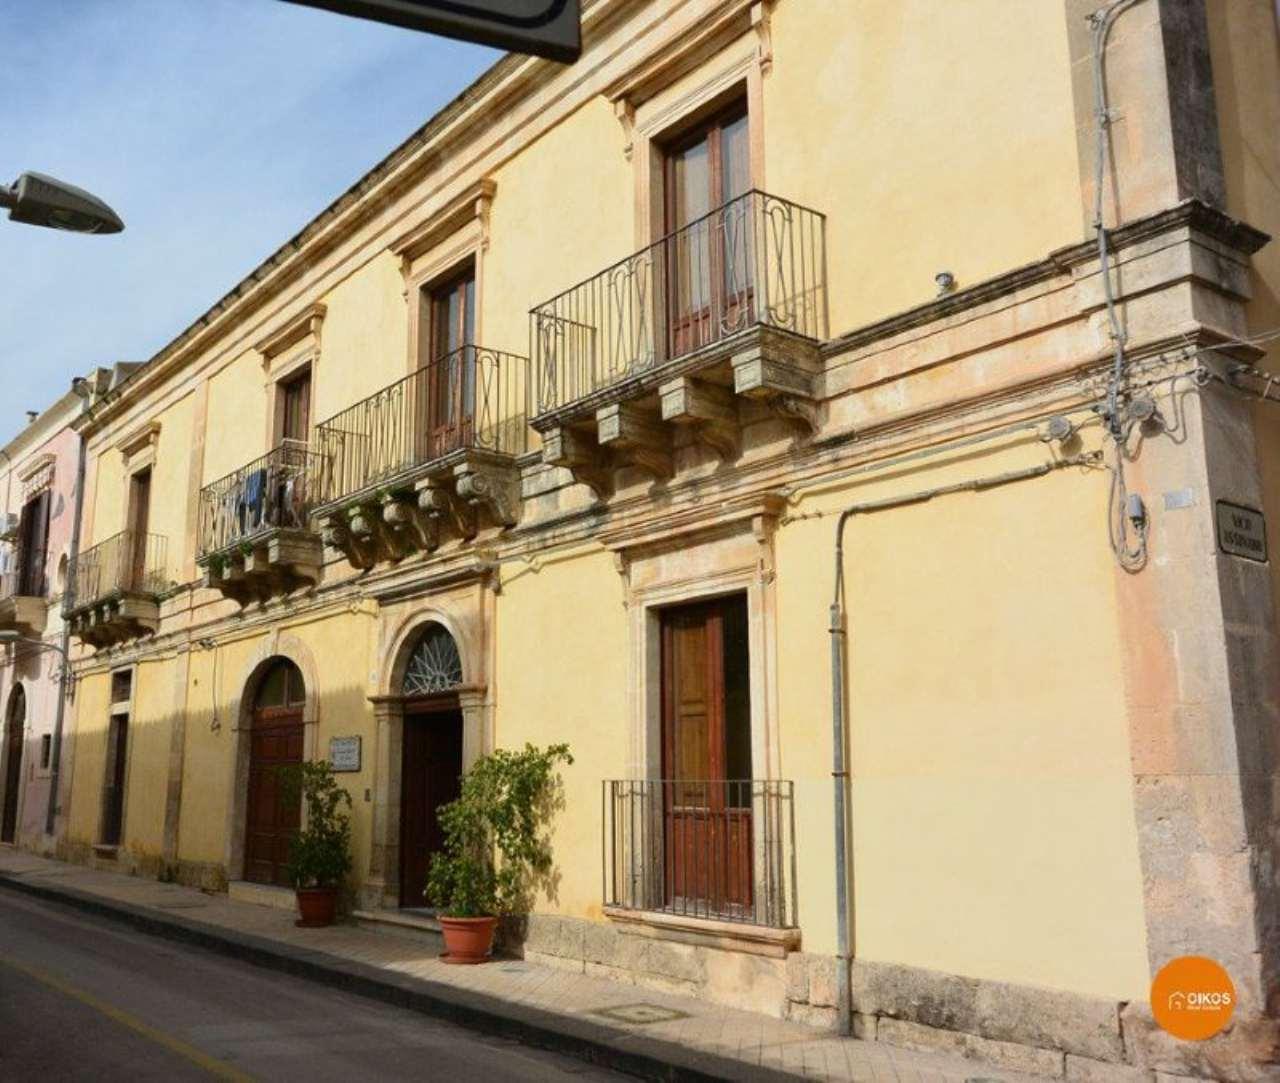 Soluzione Indipendente in vendita a Noto, 22 locali, Trattative riservate | CambioCasa.it